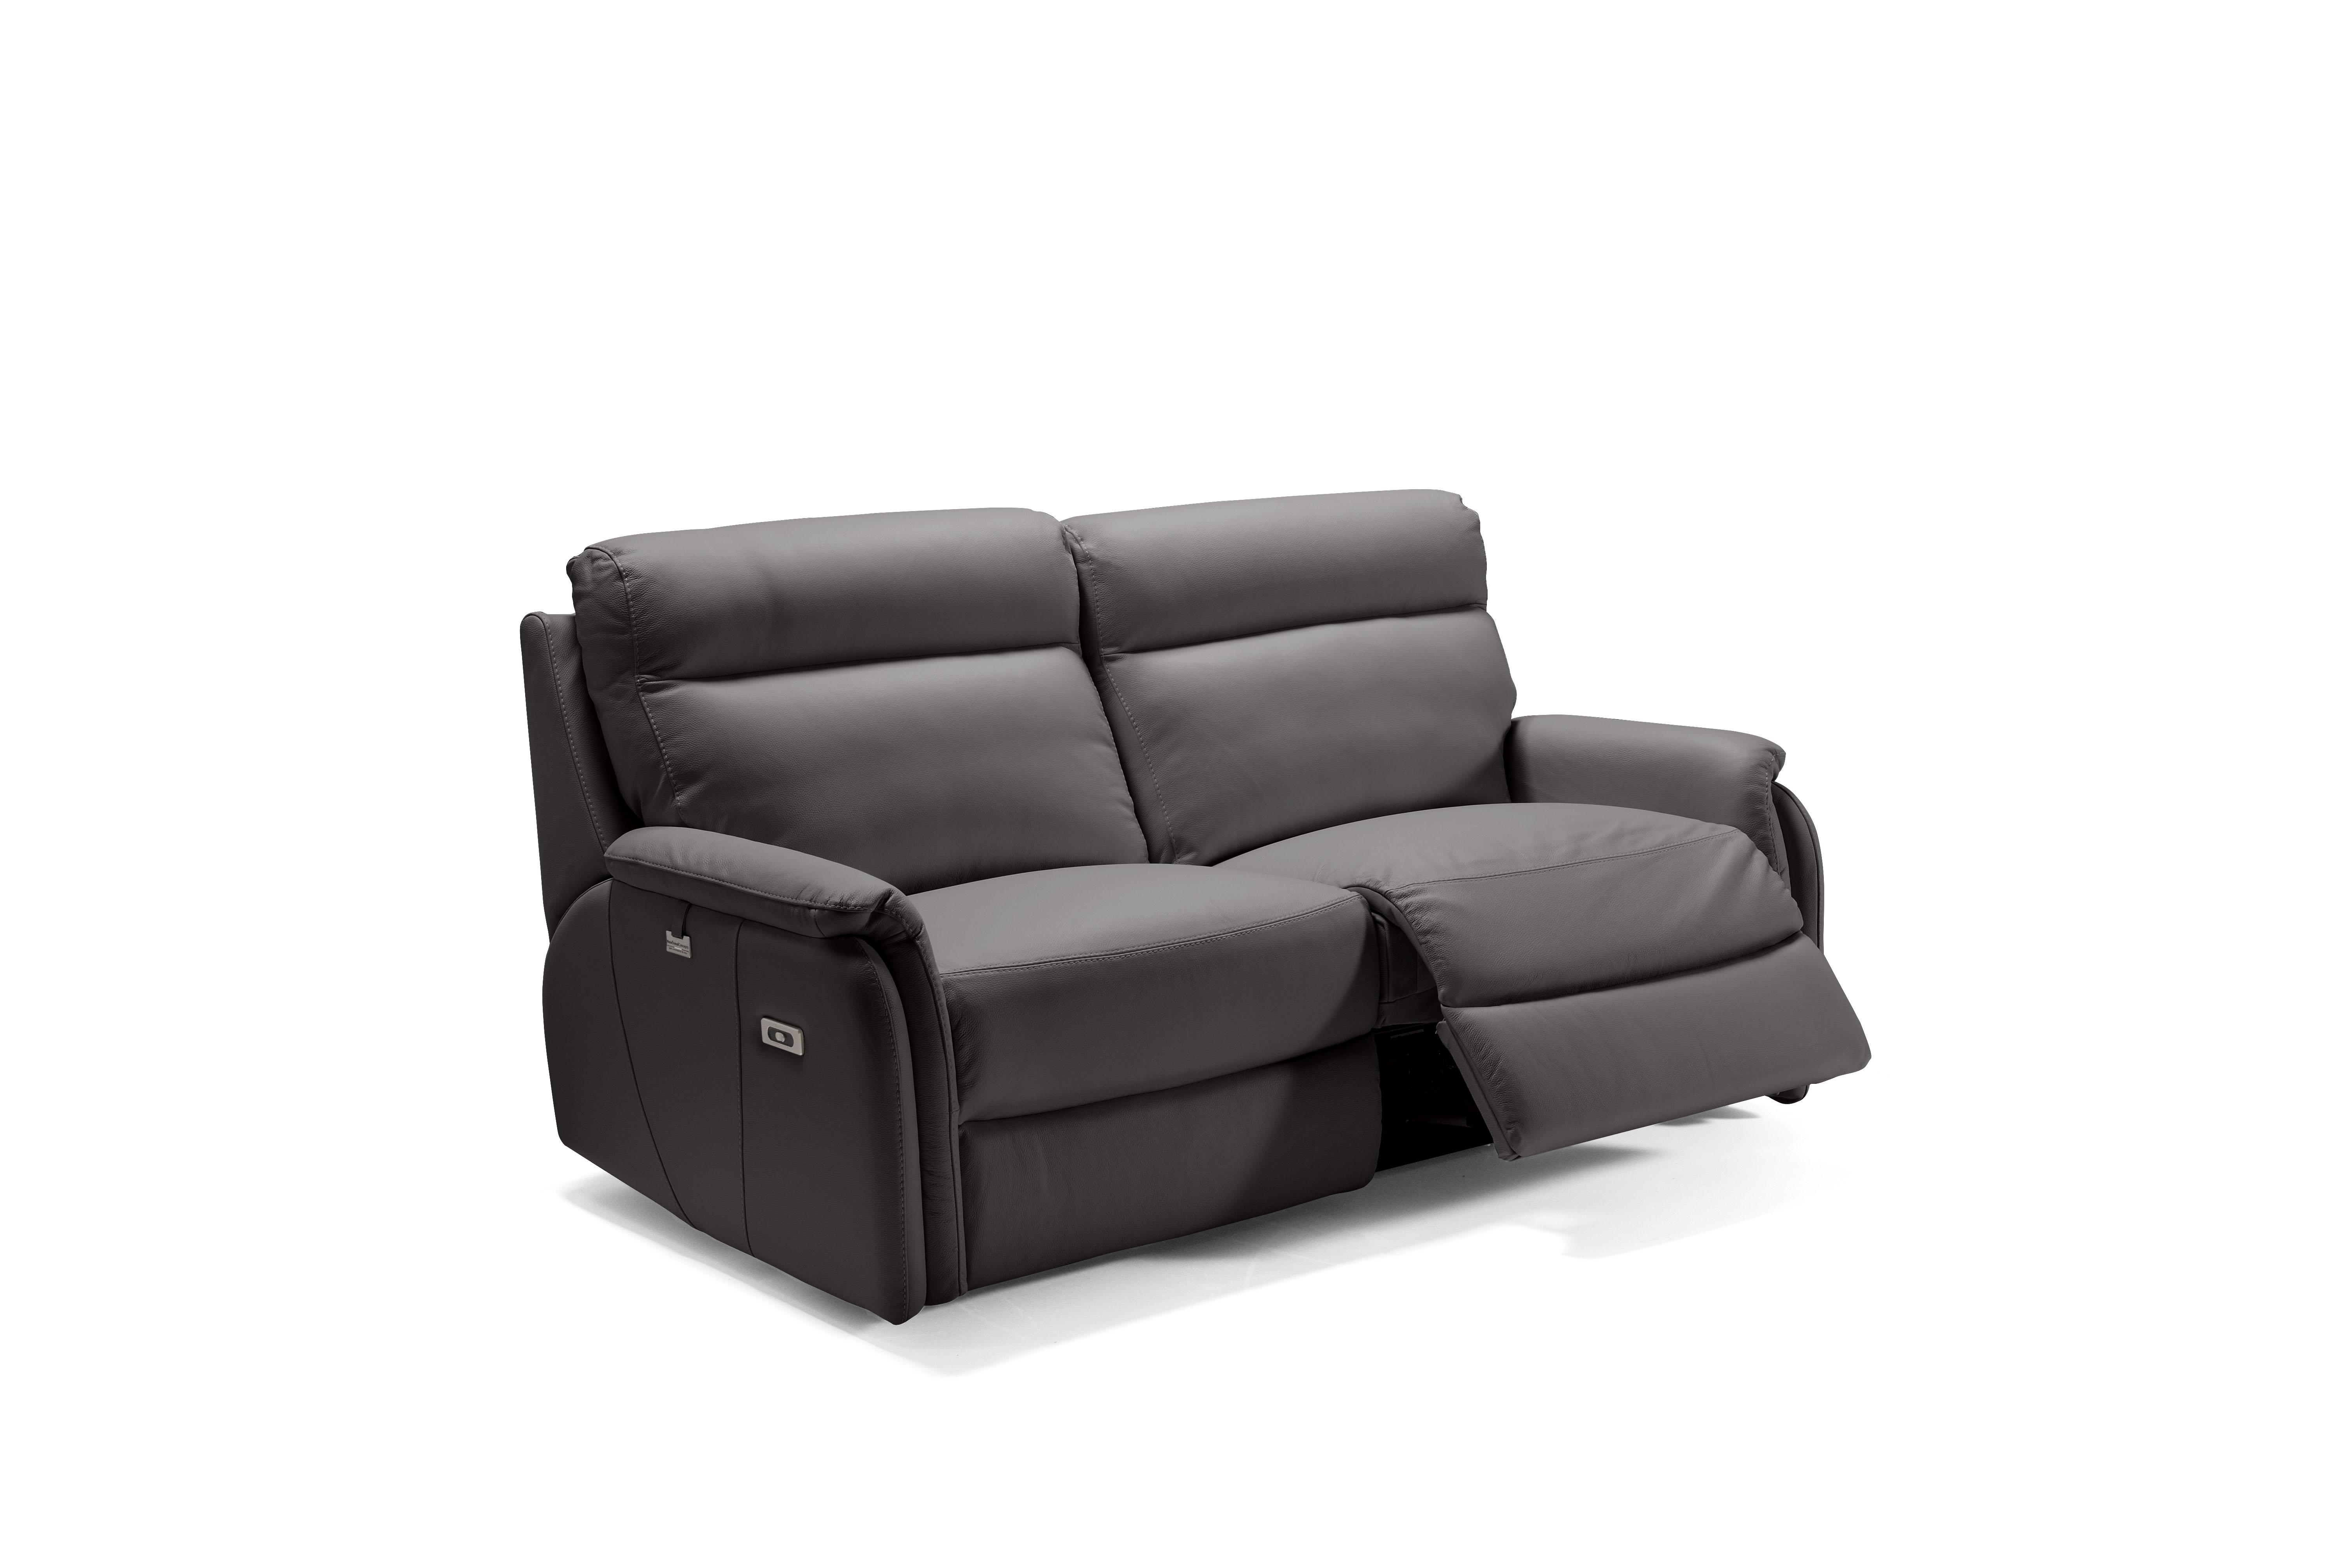 FOX Italian Leather Recliner 3 & 2 Seat Sofa - Dark Grey Grigio RRP £4801 - Image 2 of 4